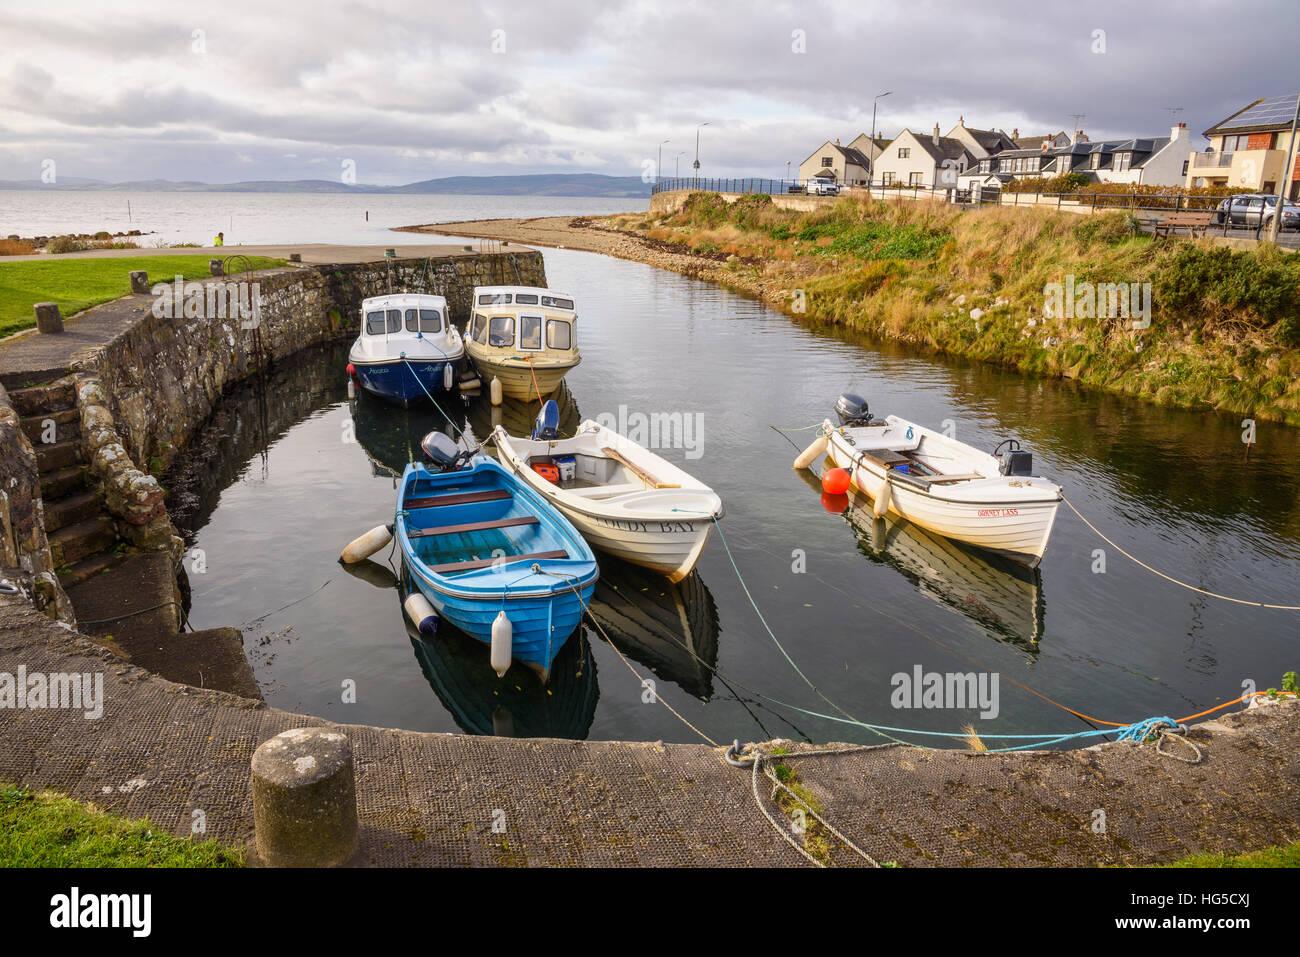 Blackwaterfoot harbour, Isle of Arran, North Ayrshire, Scotland, United Kingdom - Stock Image